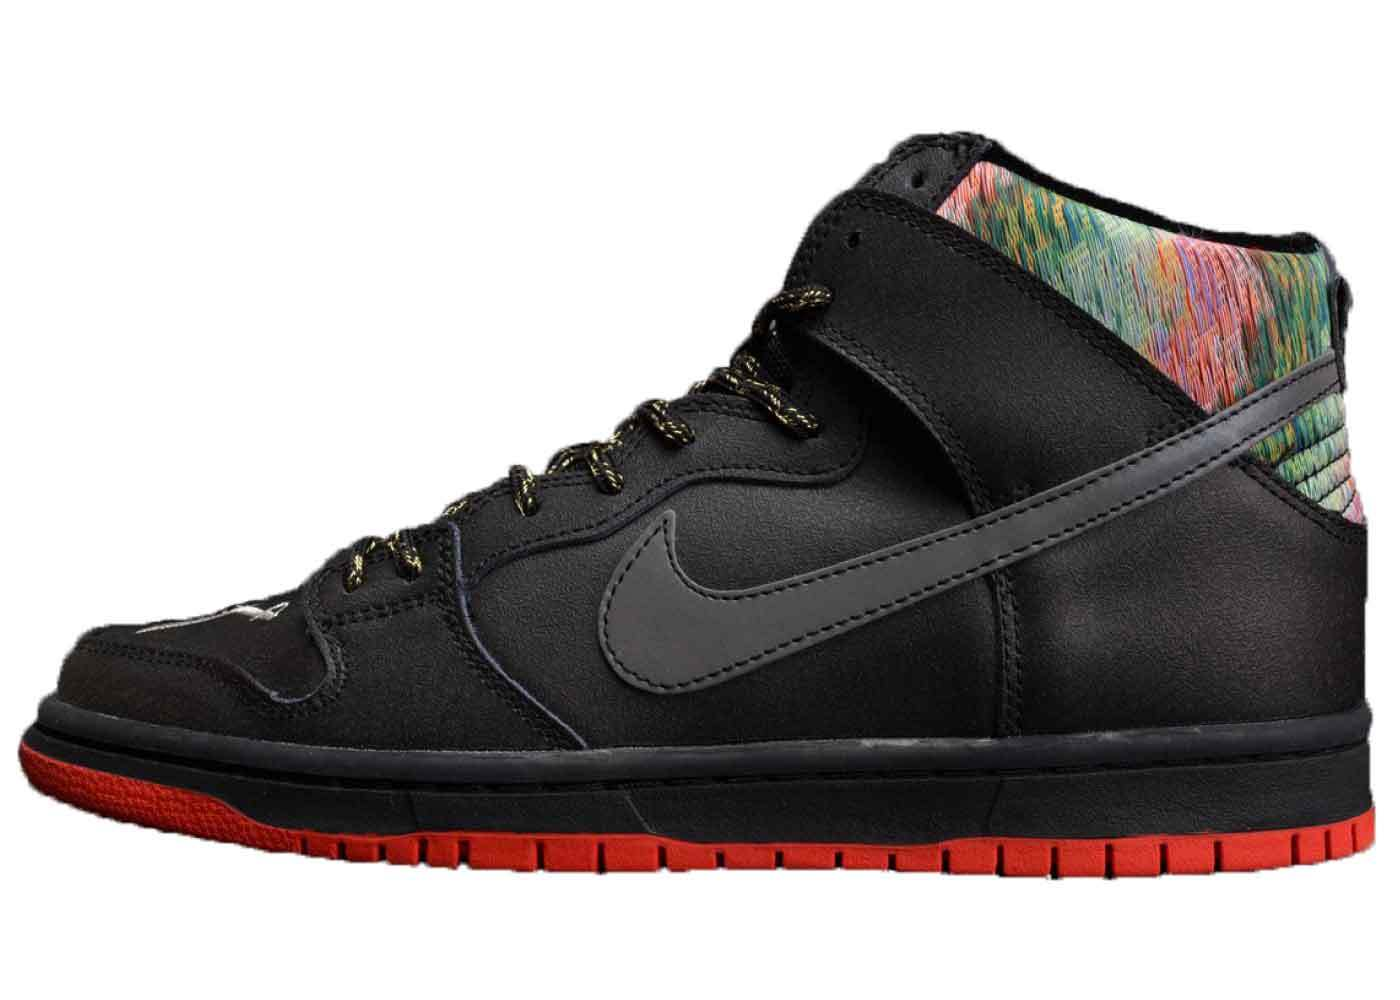 Nike SB Dunk High Spot Gasparillaの写真